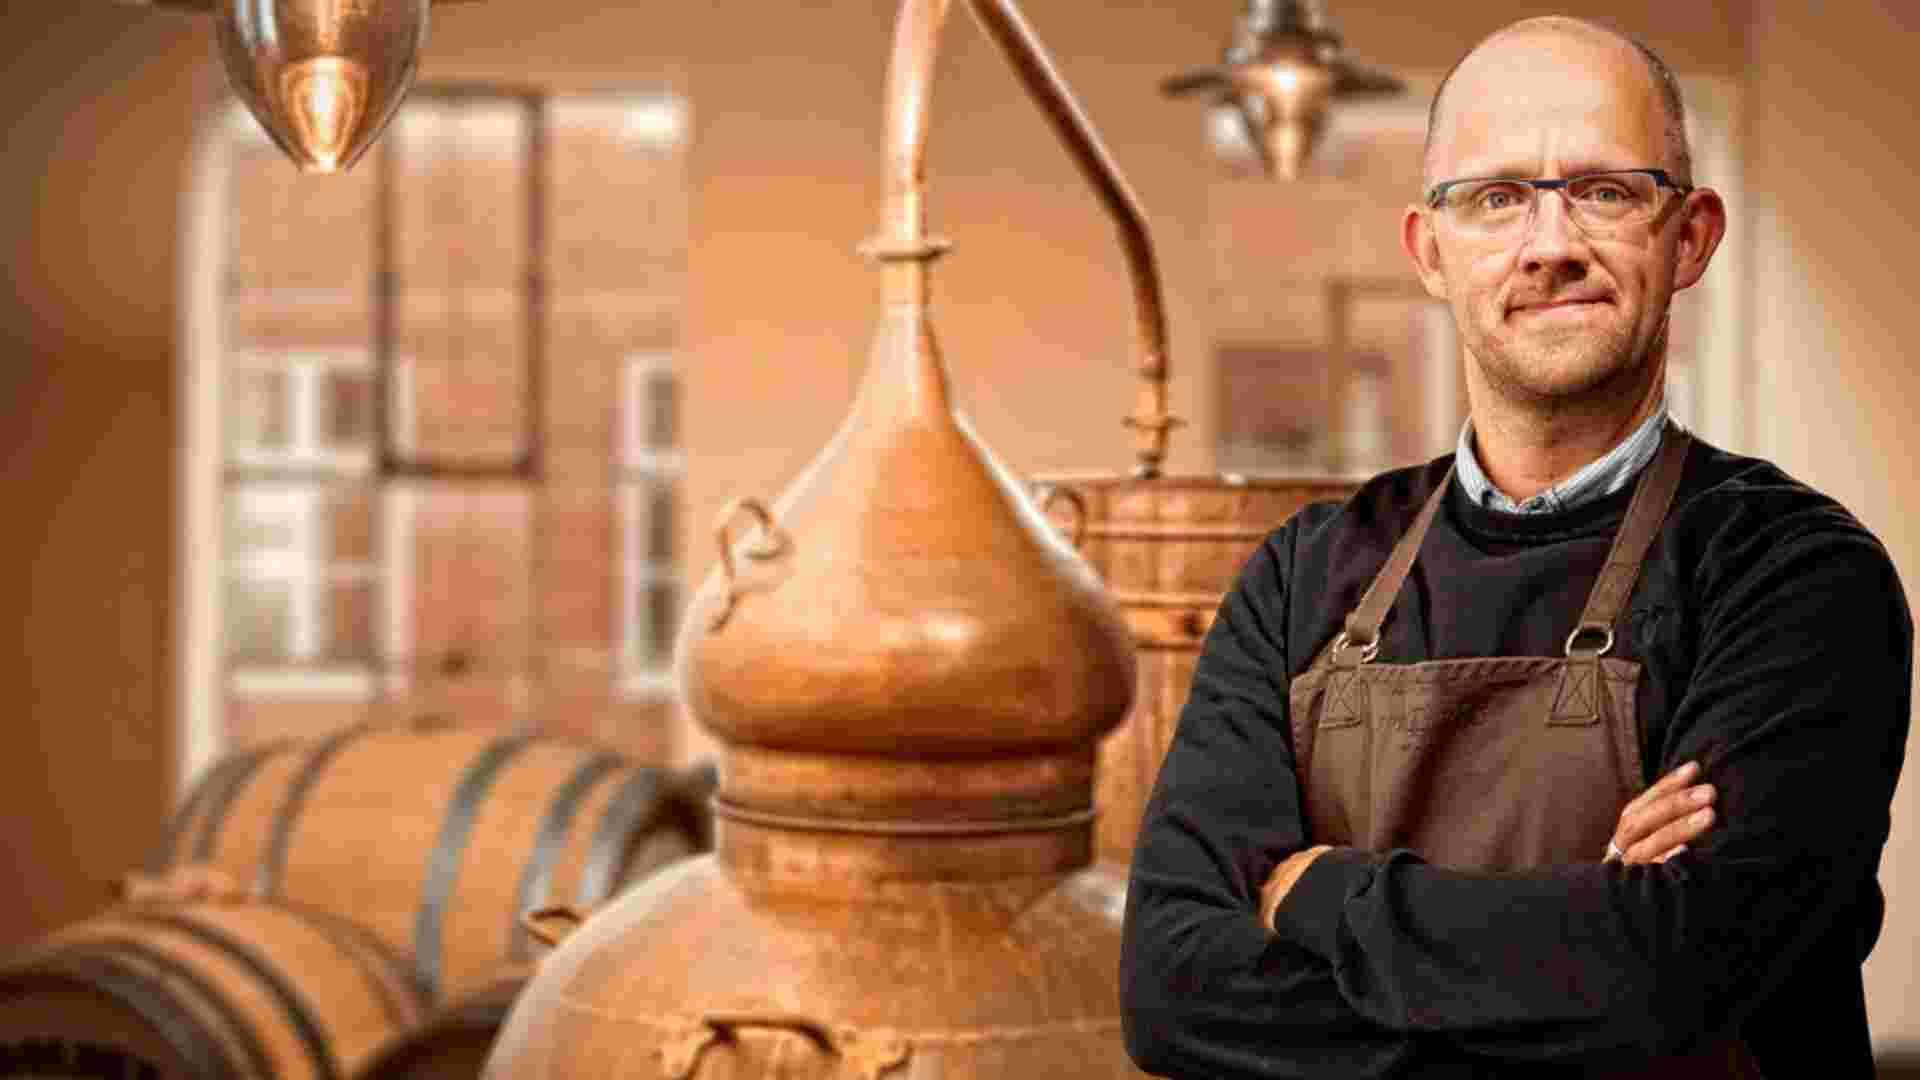 Trolden Destilleri & Bryghus ApS